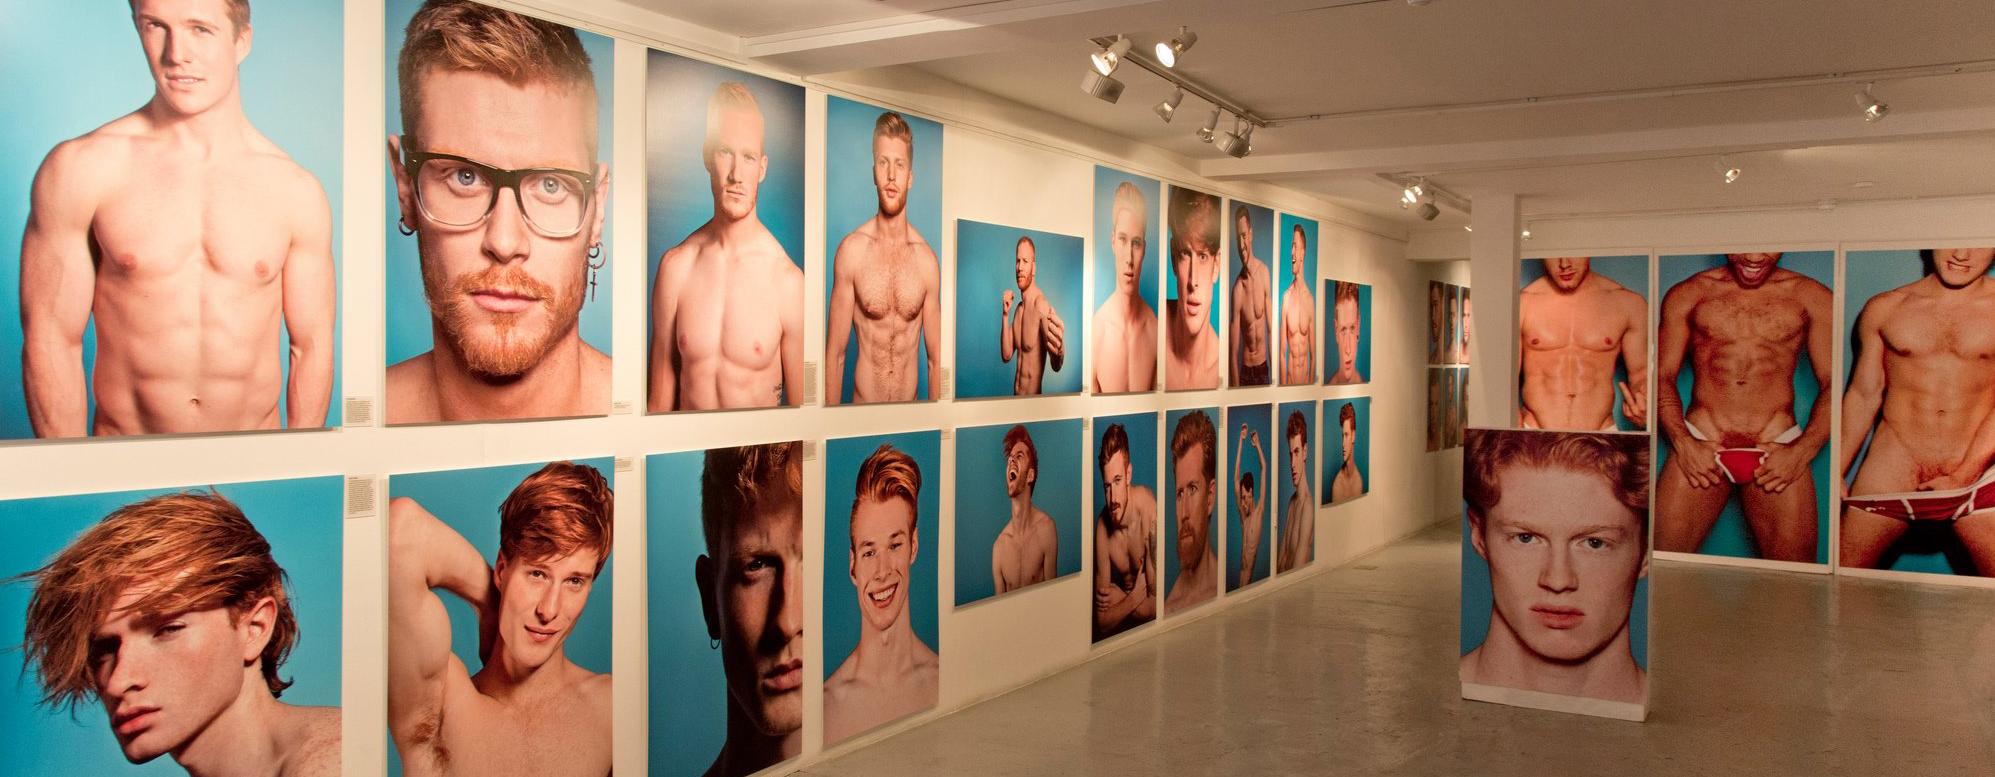 red_hot_exhibition portada